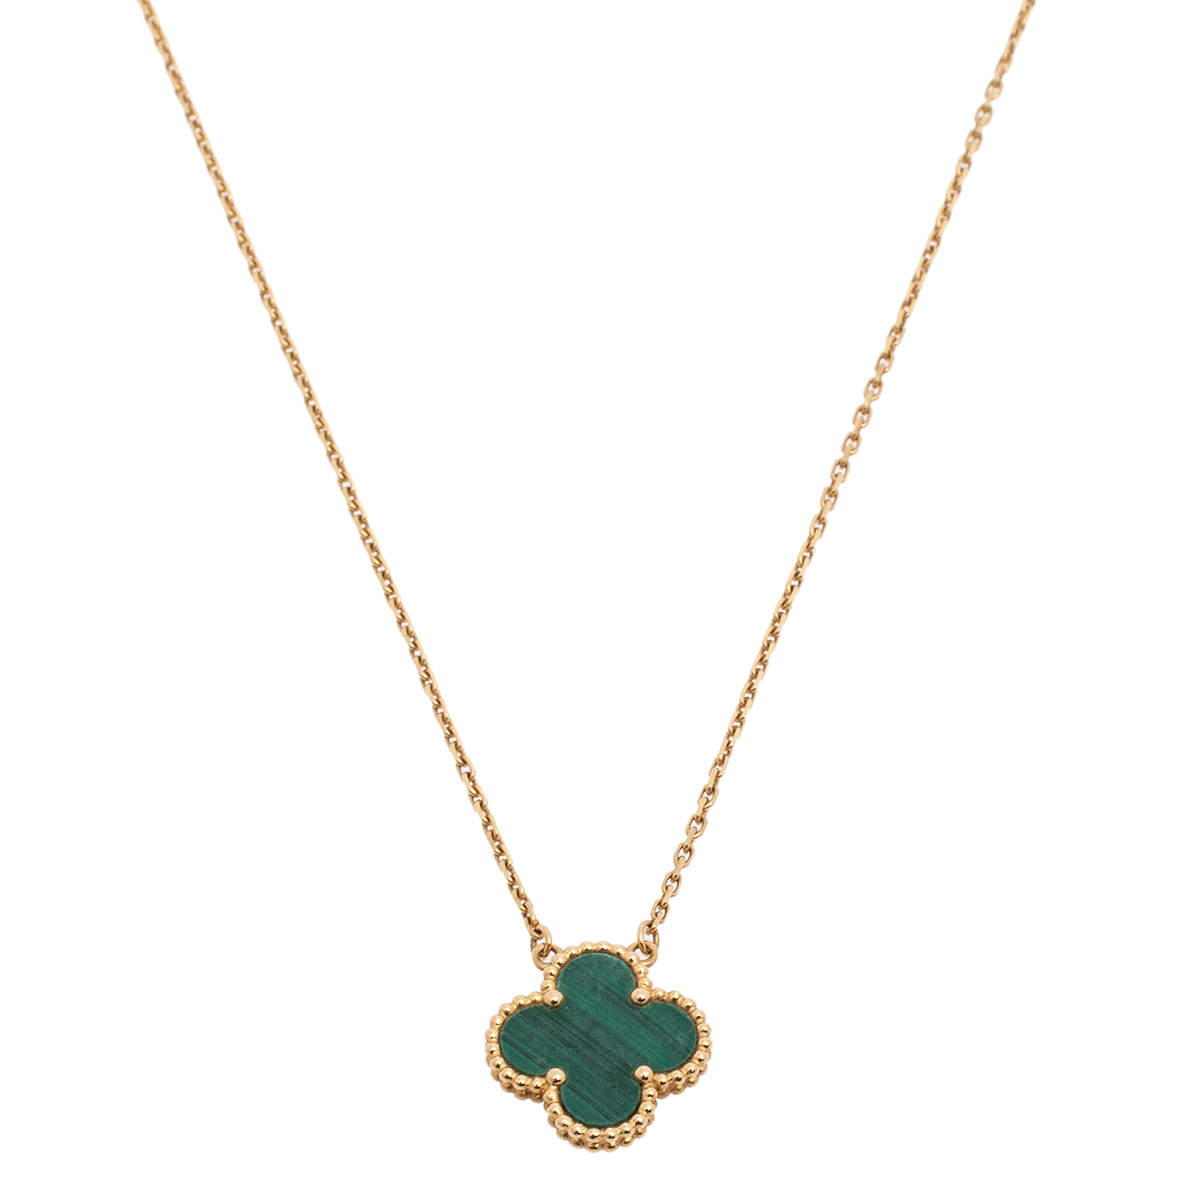 Van Cleef & Arpels Vintage Alhambra 18K Yellow Gold Malachite Pendant Necklace